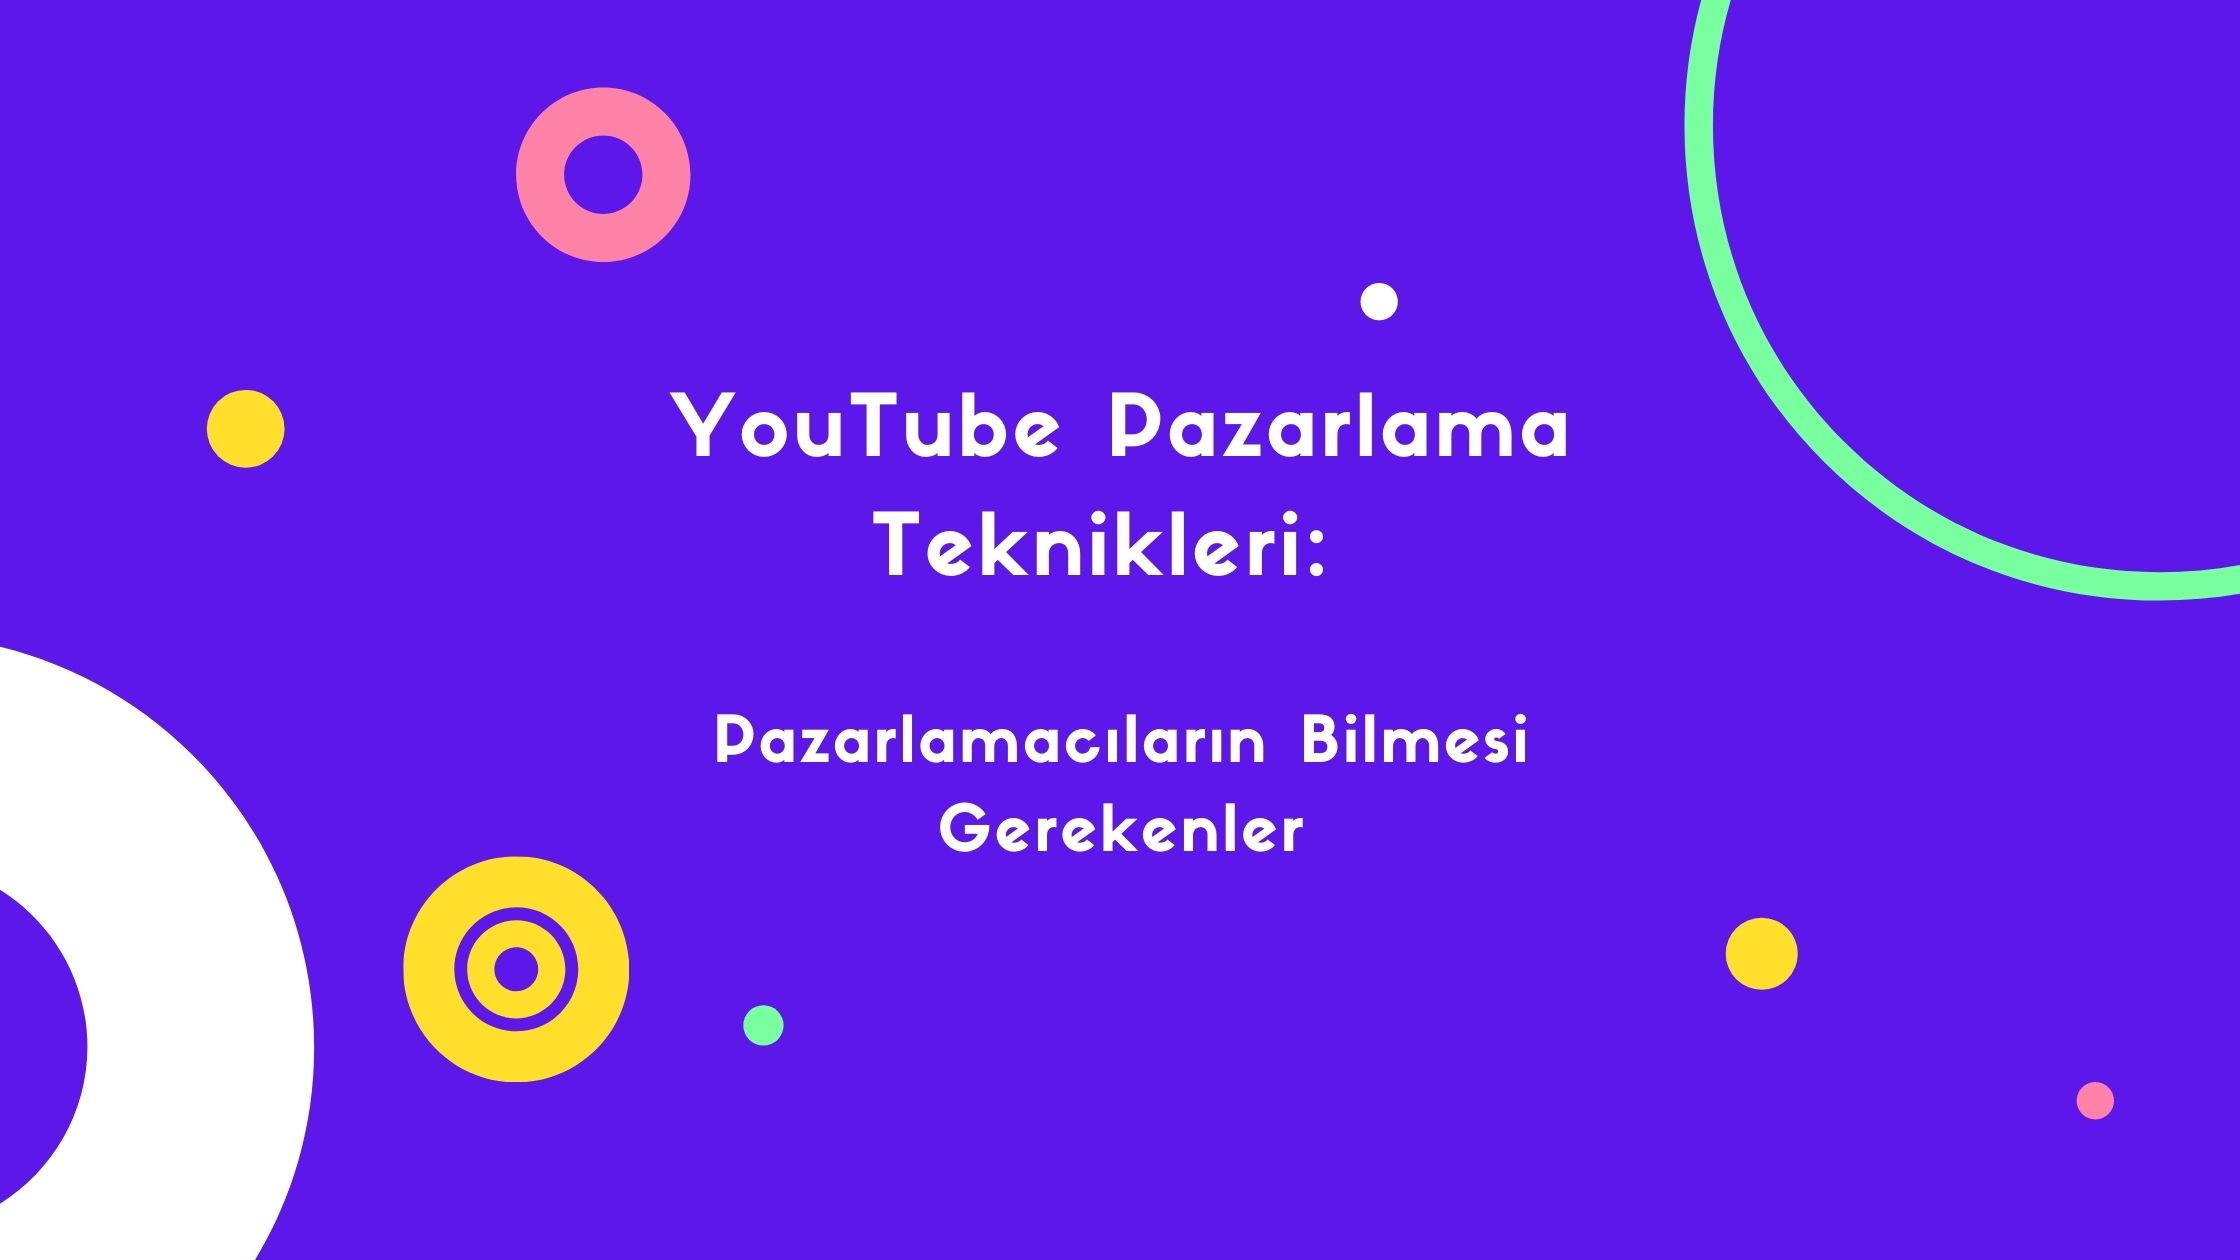 YouTube Pazarlama Teknikleri